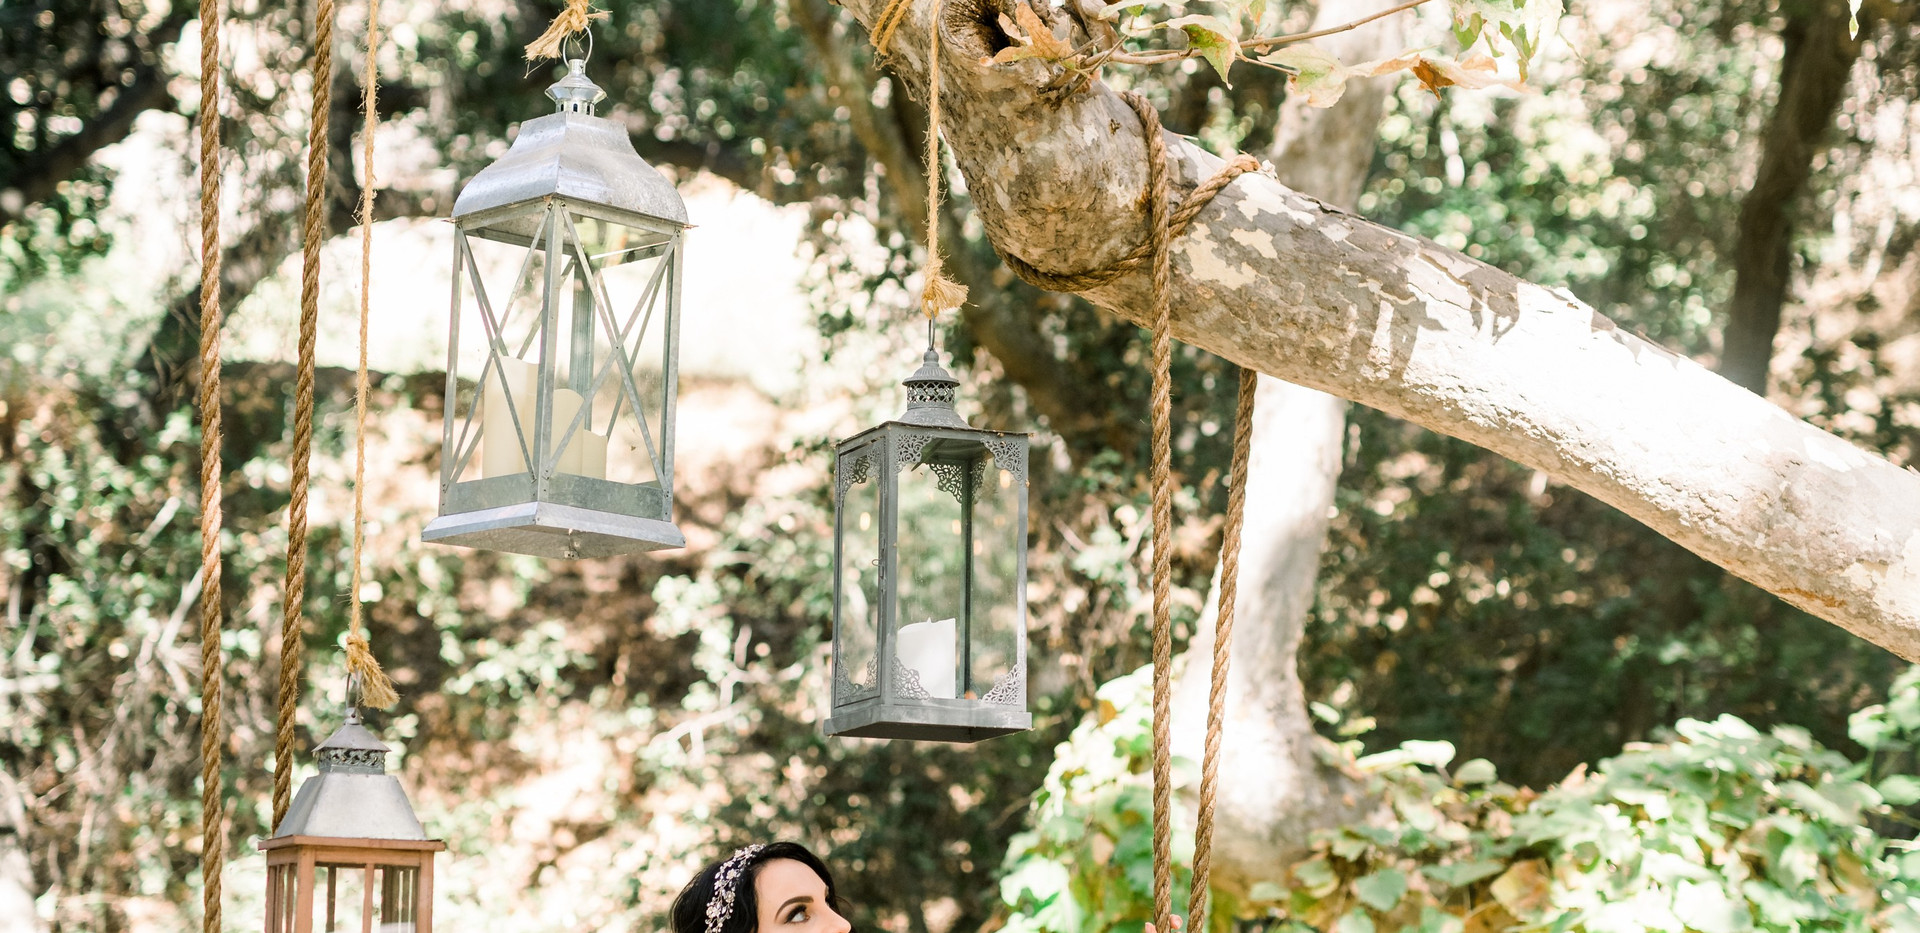 Luna Bella - Snow White Inspired Photoshoot